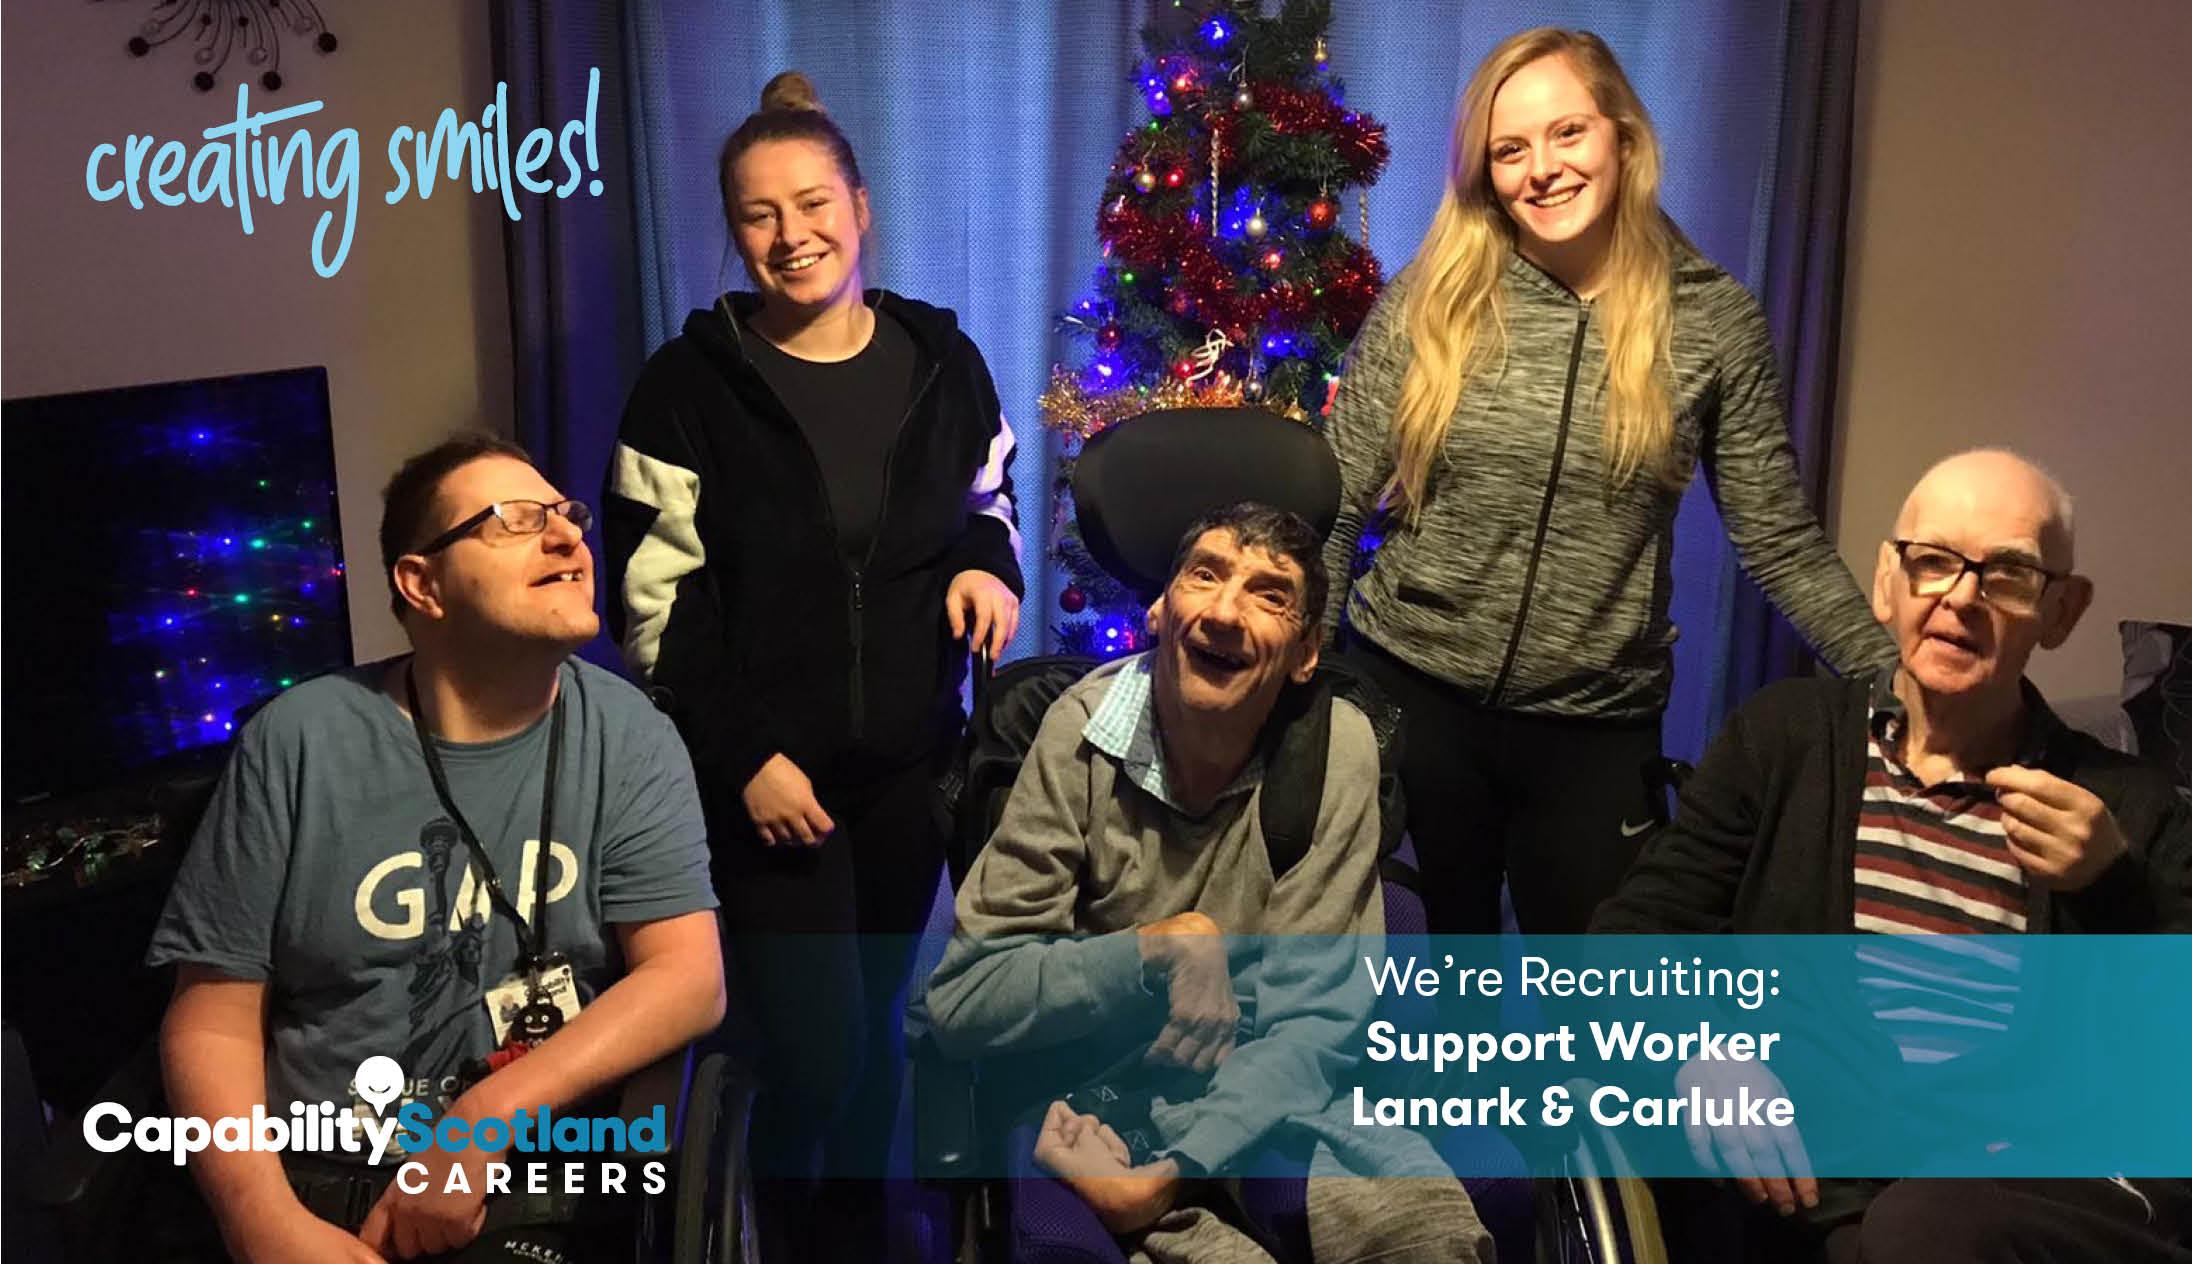 Lanark Houses Support Worker 3